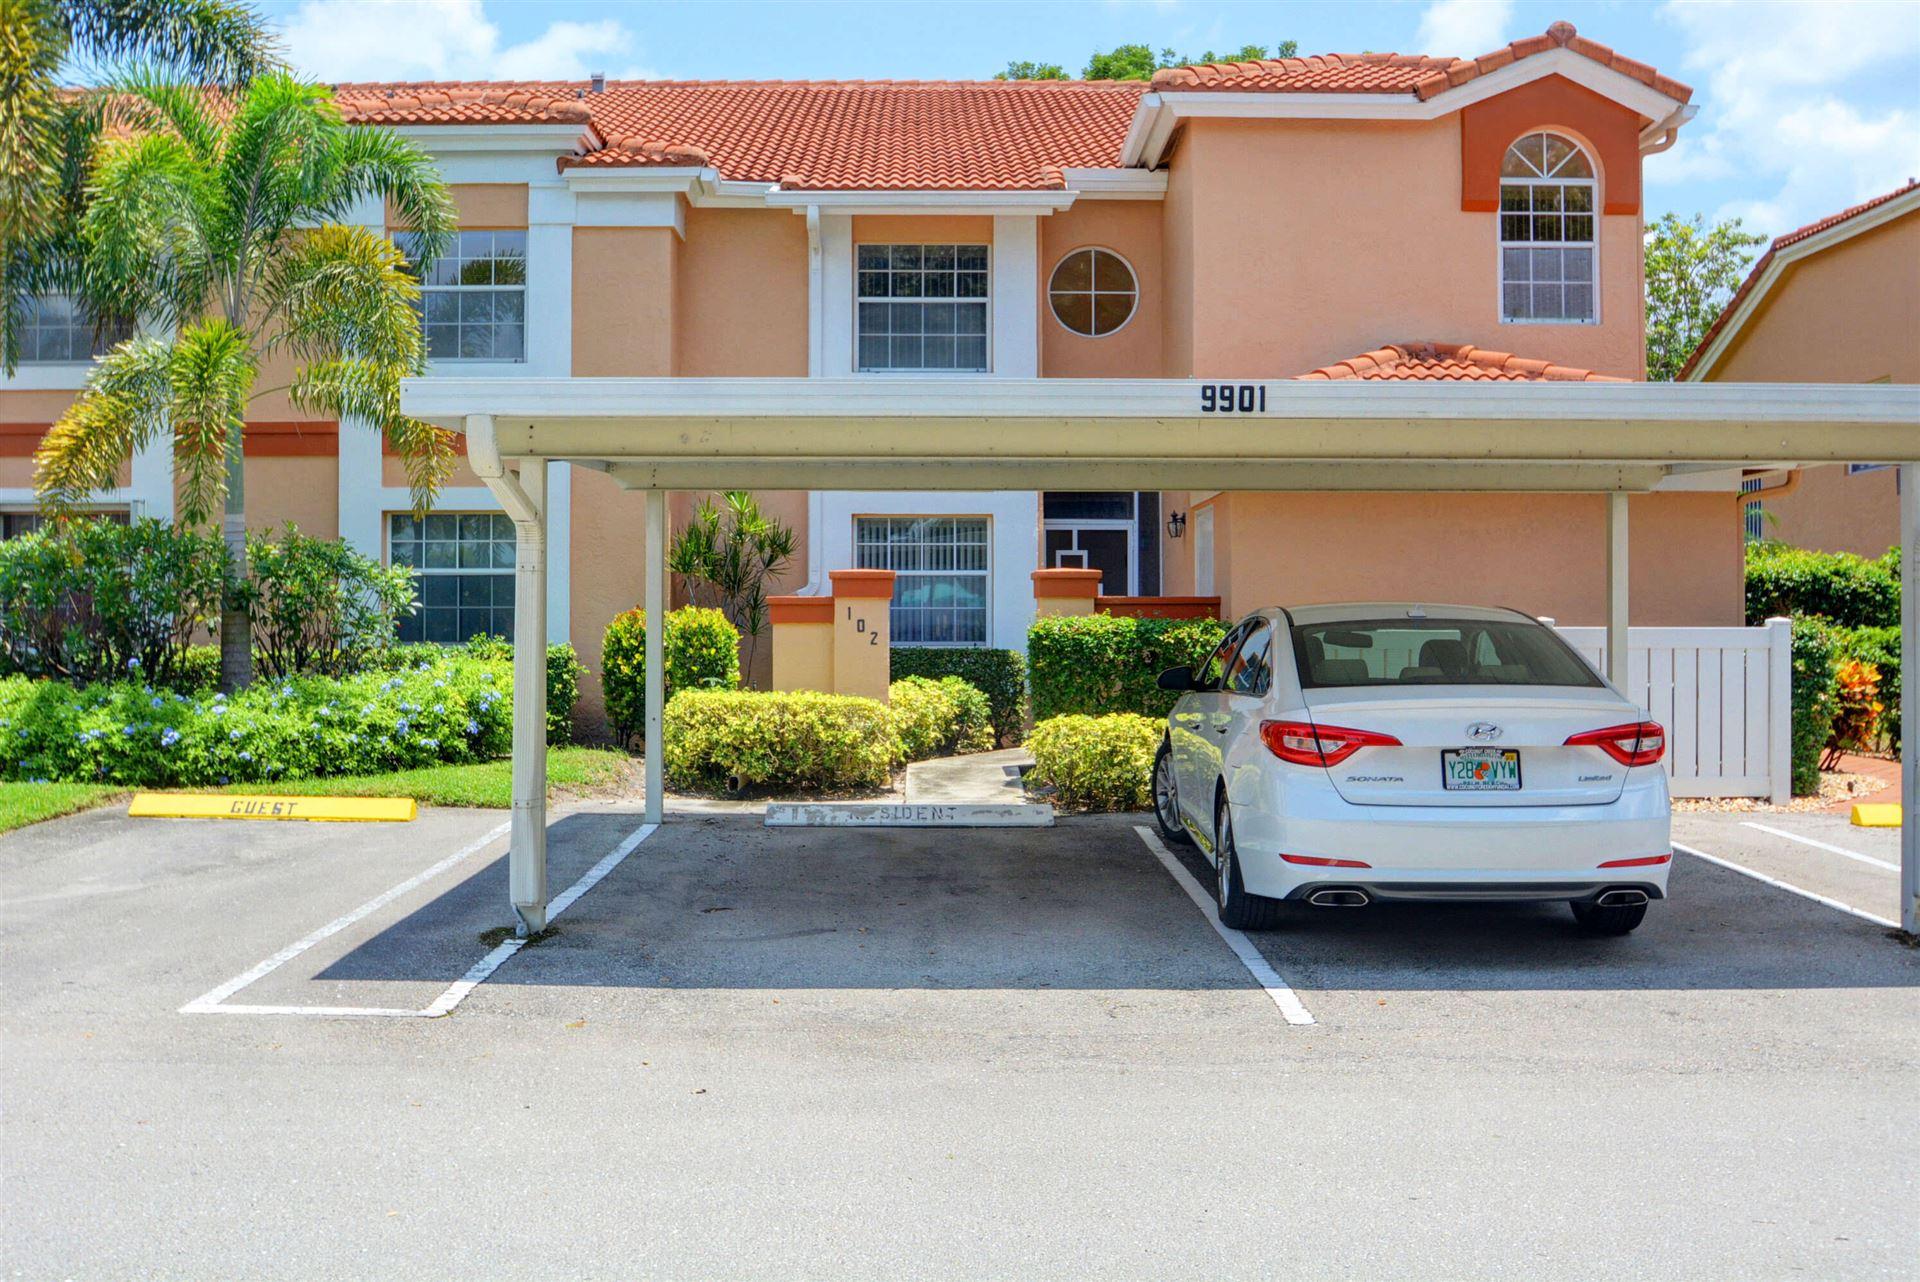 Photo of 9901 Seacrest Circle #102, Boynton Beach, FL 33437 (MLS # RX-10733666)